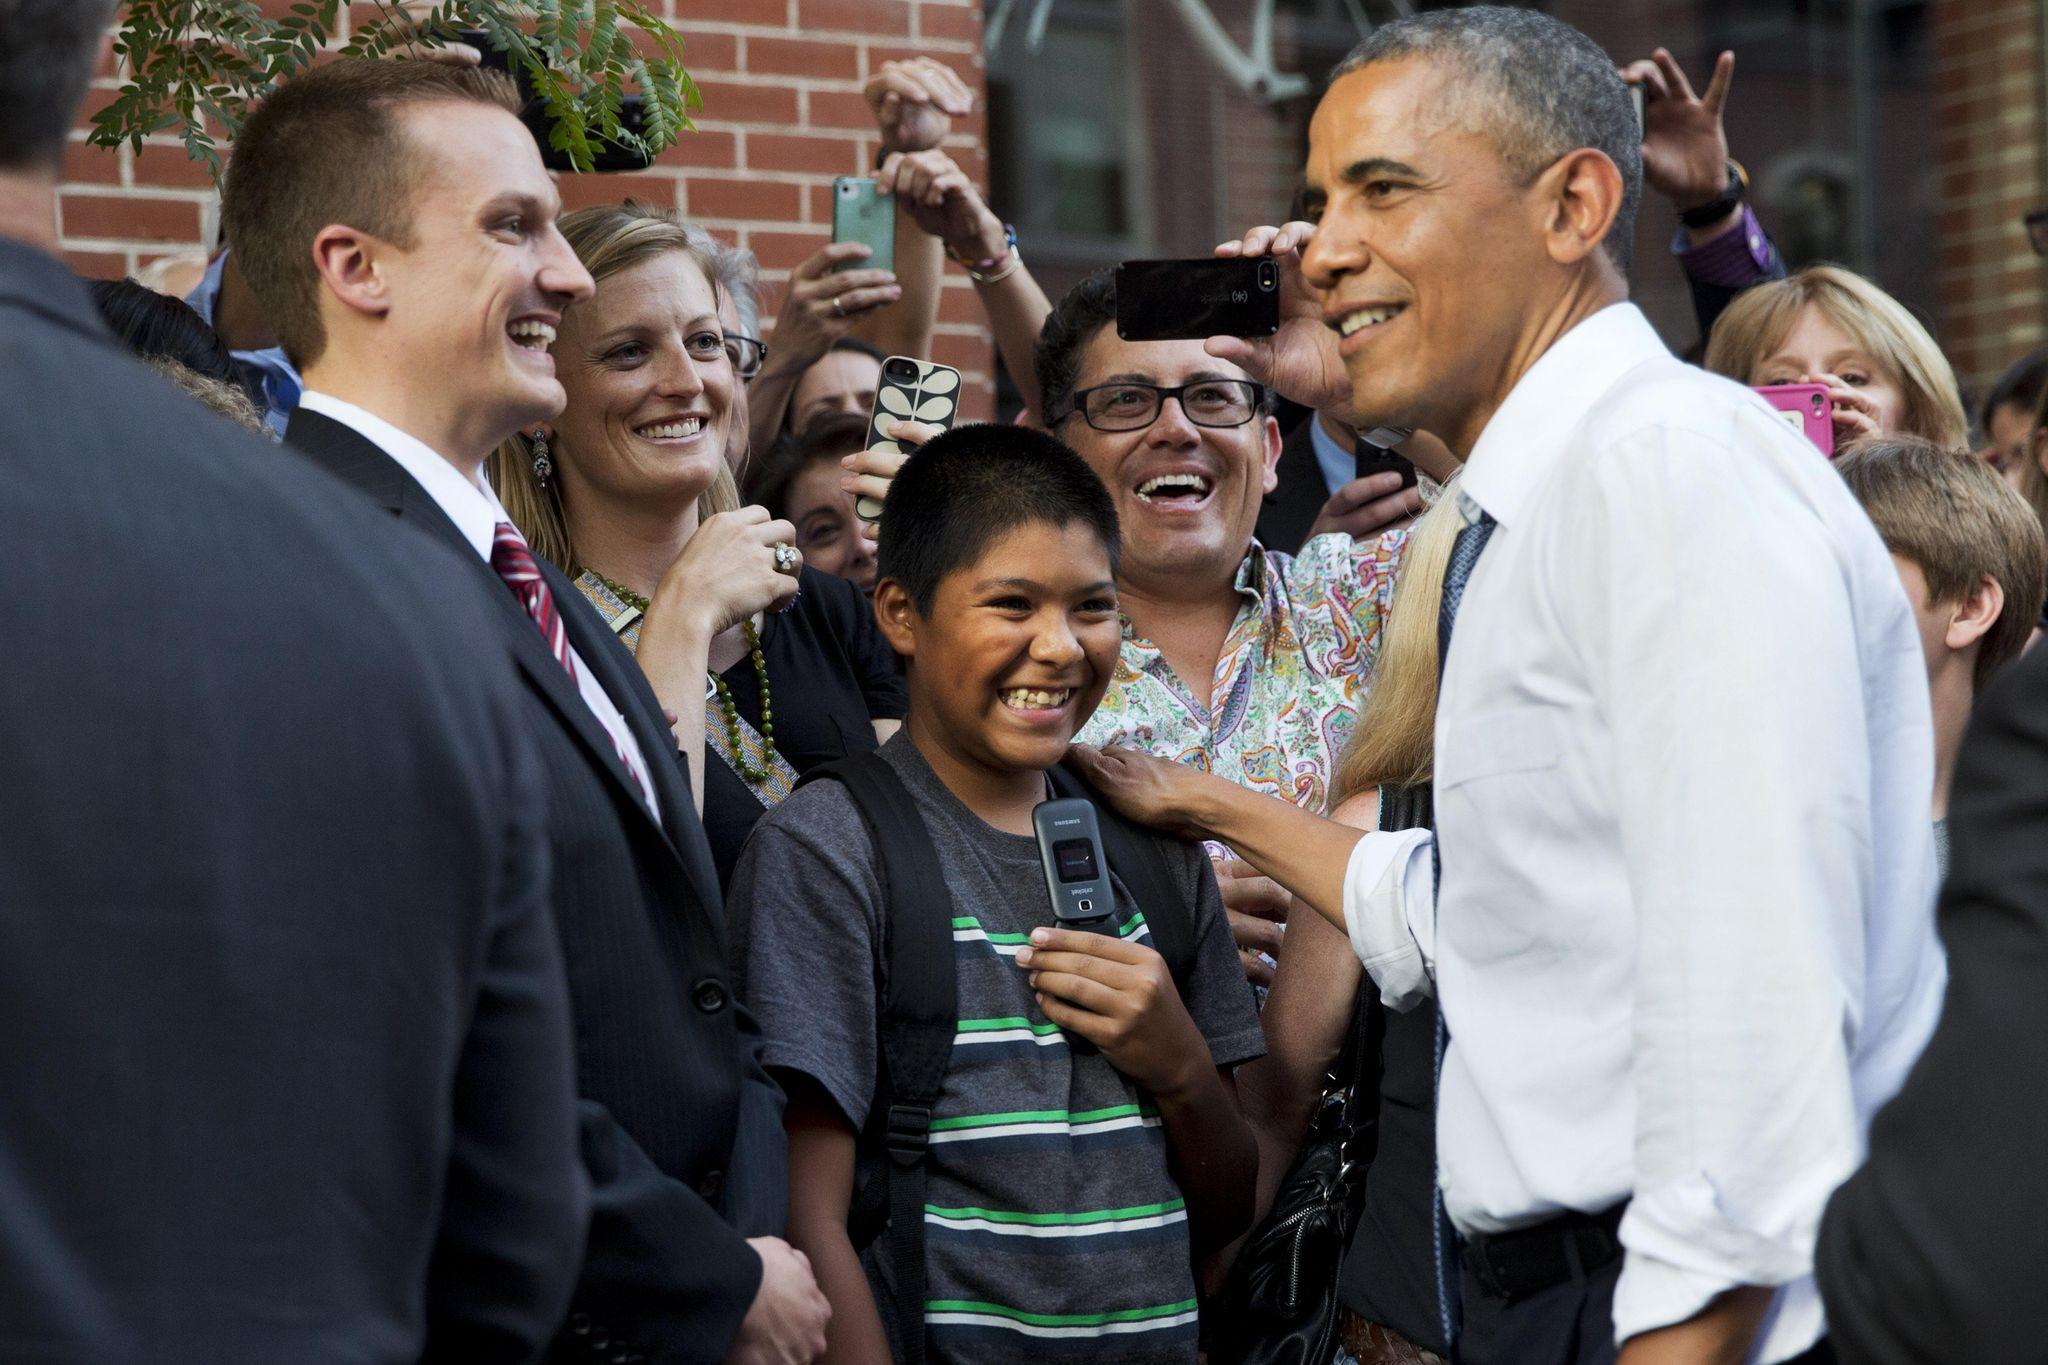 Colorado man offers Obama a toke of marijuana — a Rocky Mountain 'high'